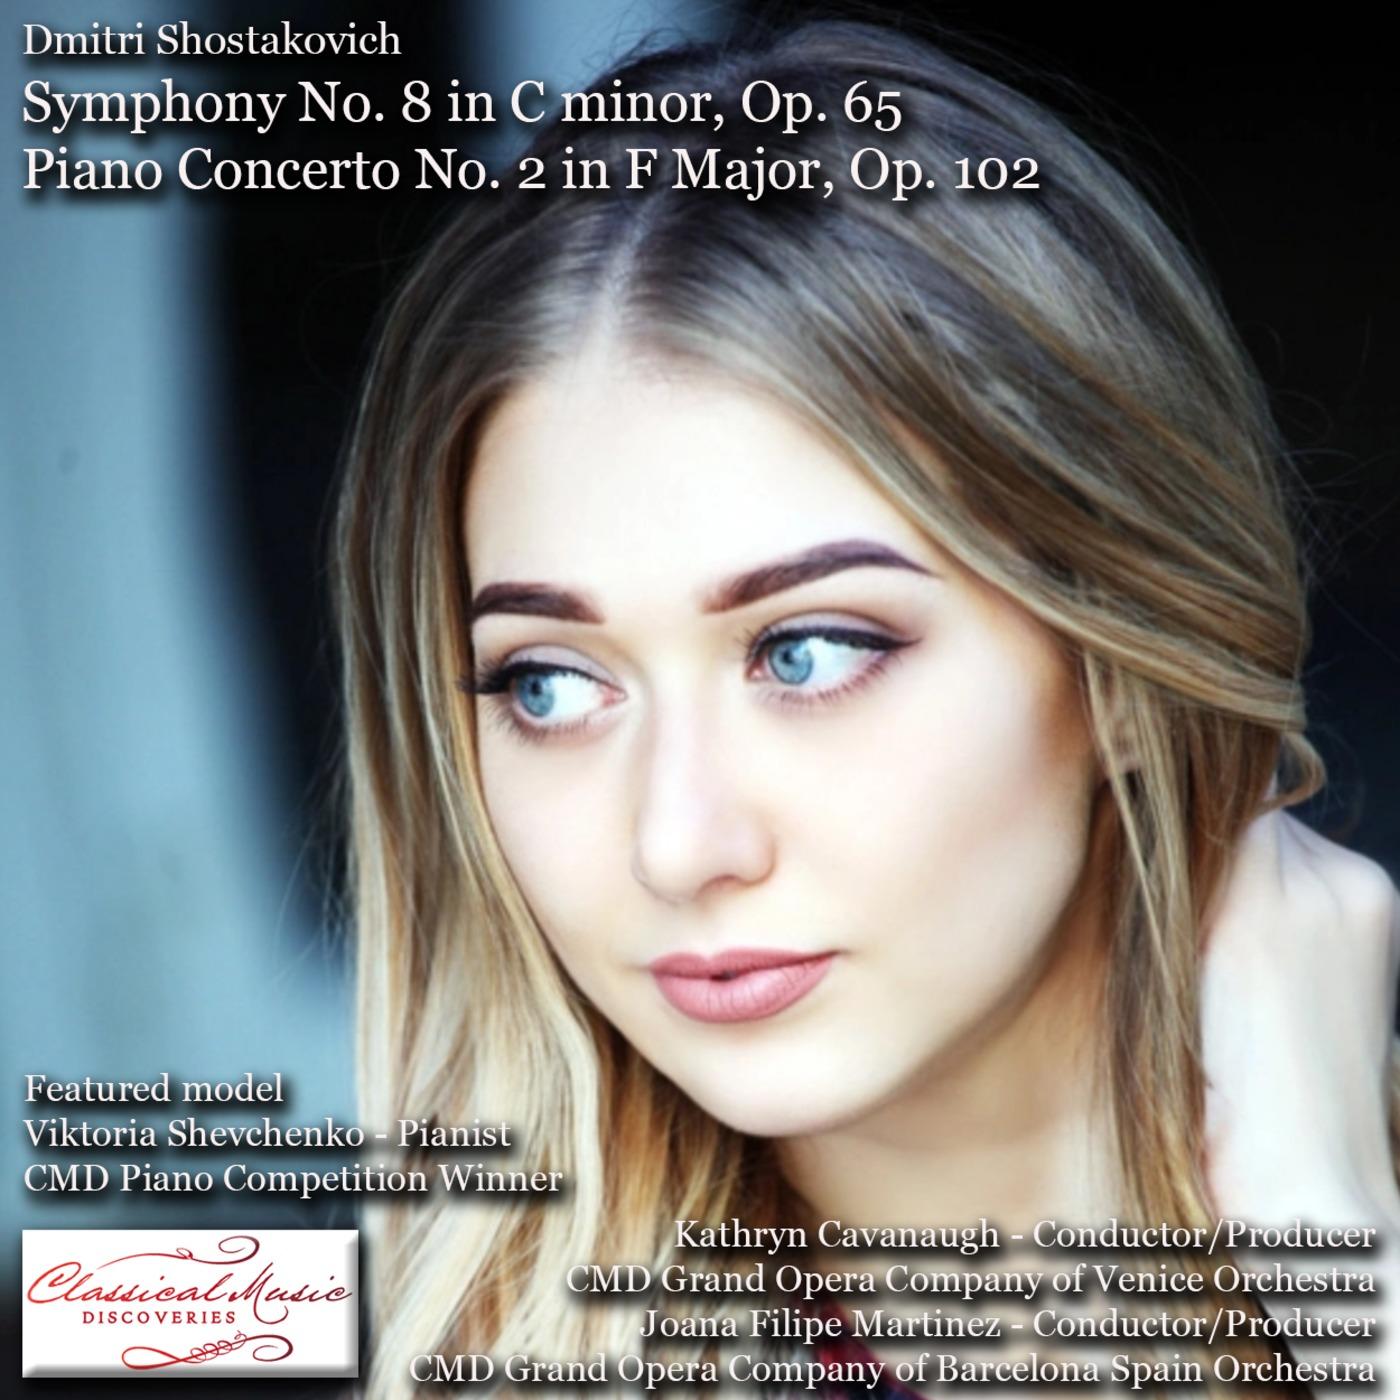 15116 Shostakovich - Symphony 8 And Piano Concerto 2 Classical Music